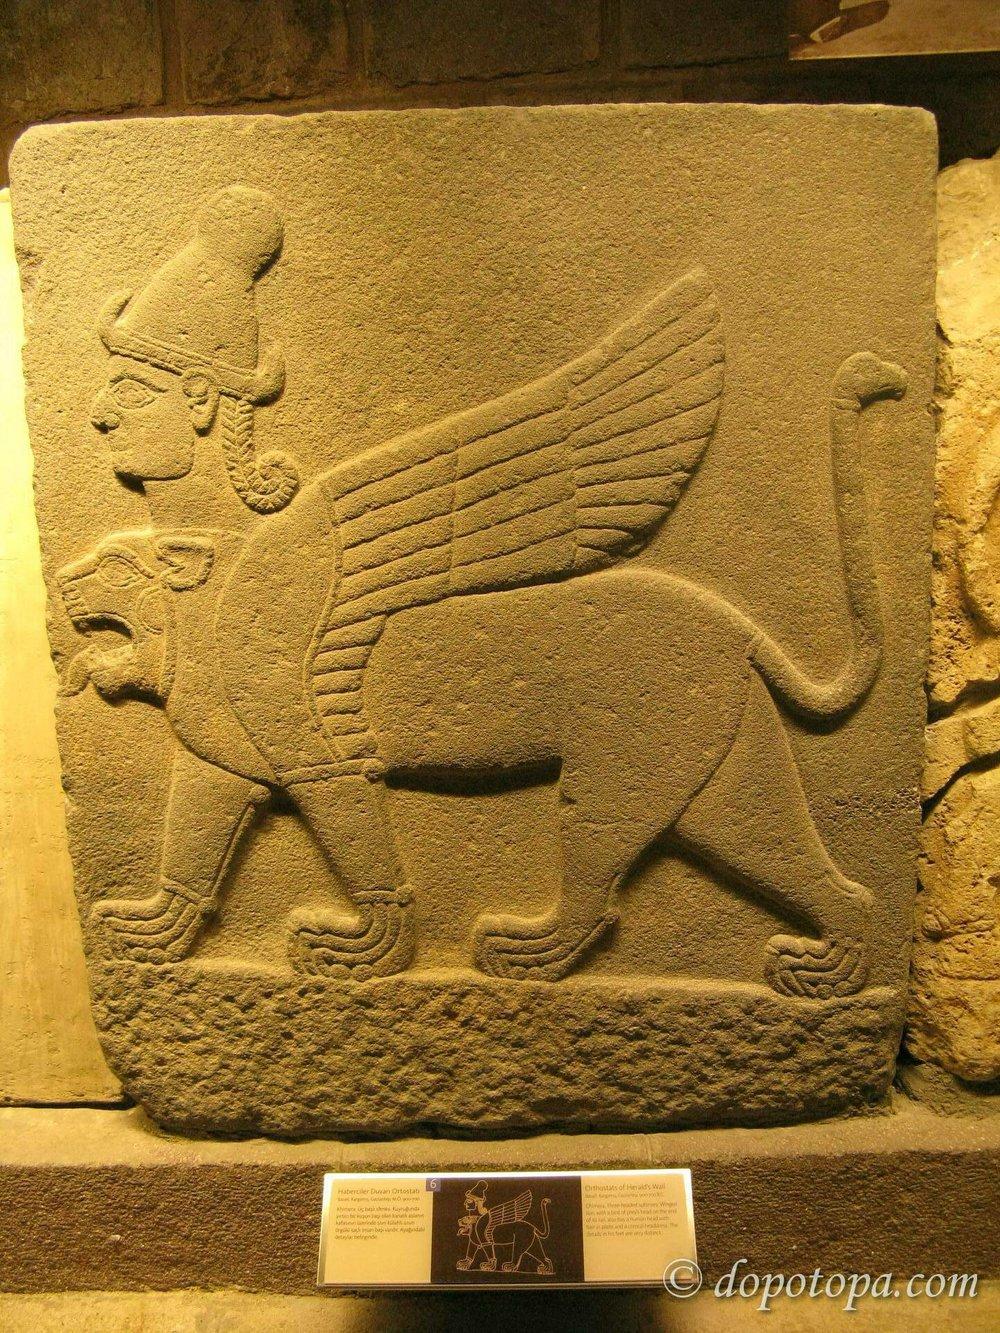 ankara_museum_stone_artefacts_16.JPG